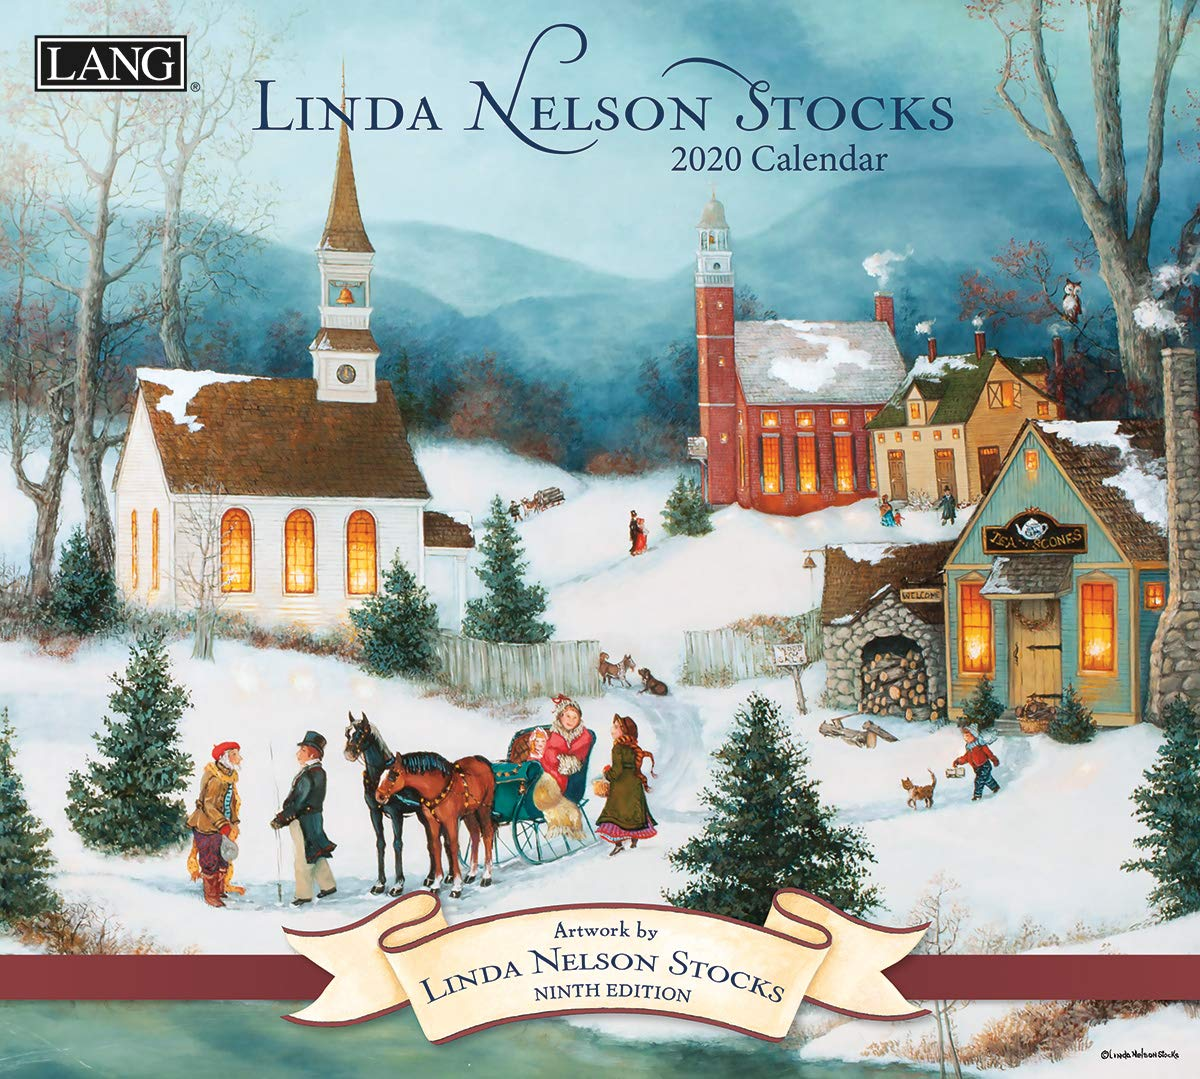 The LANG Companies Linda Nelson Stocks 2020 Wall Calendar (20991001924) by The LANG Companies